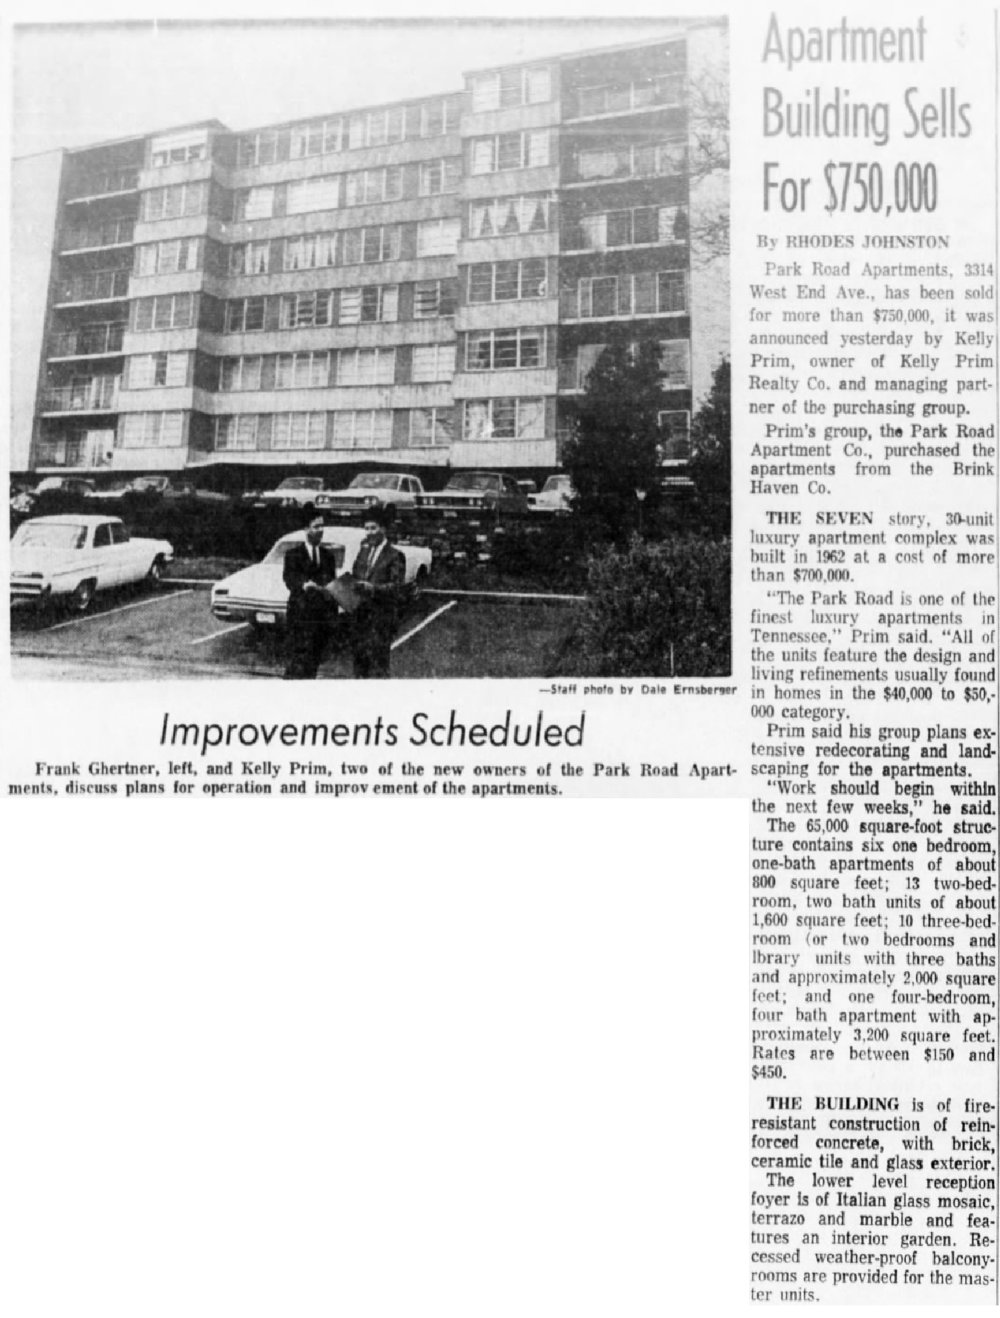 Sale_of_Park_Road_April_7_1968.jpg